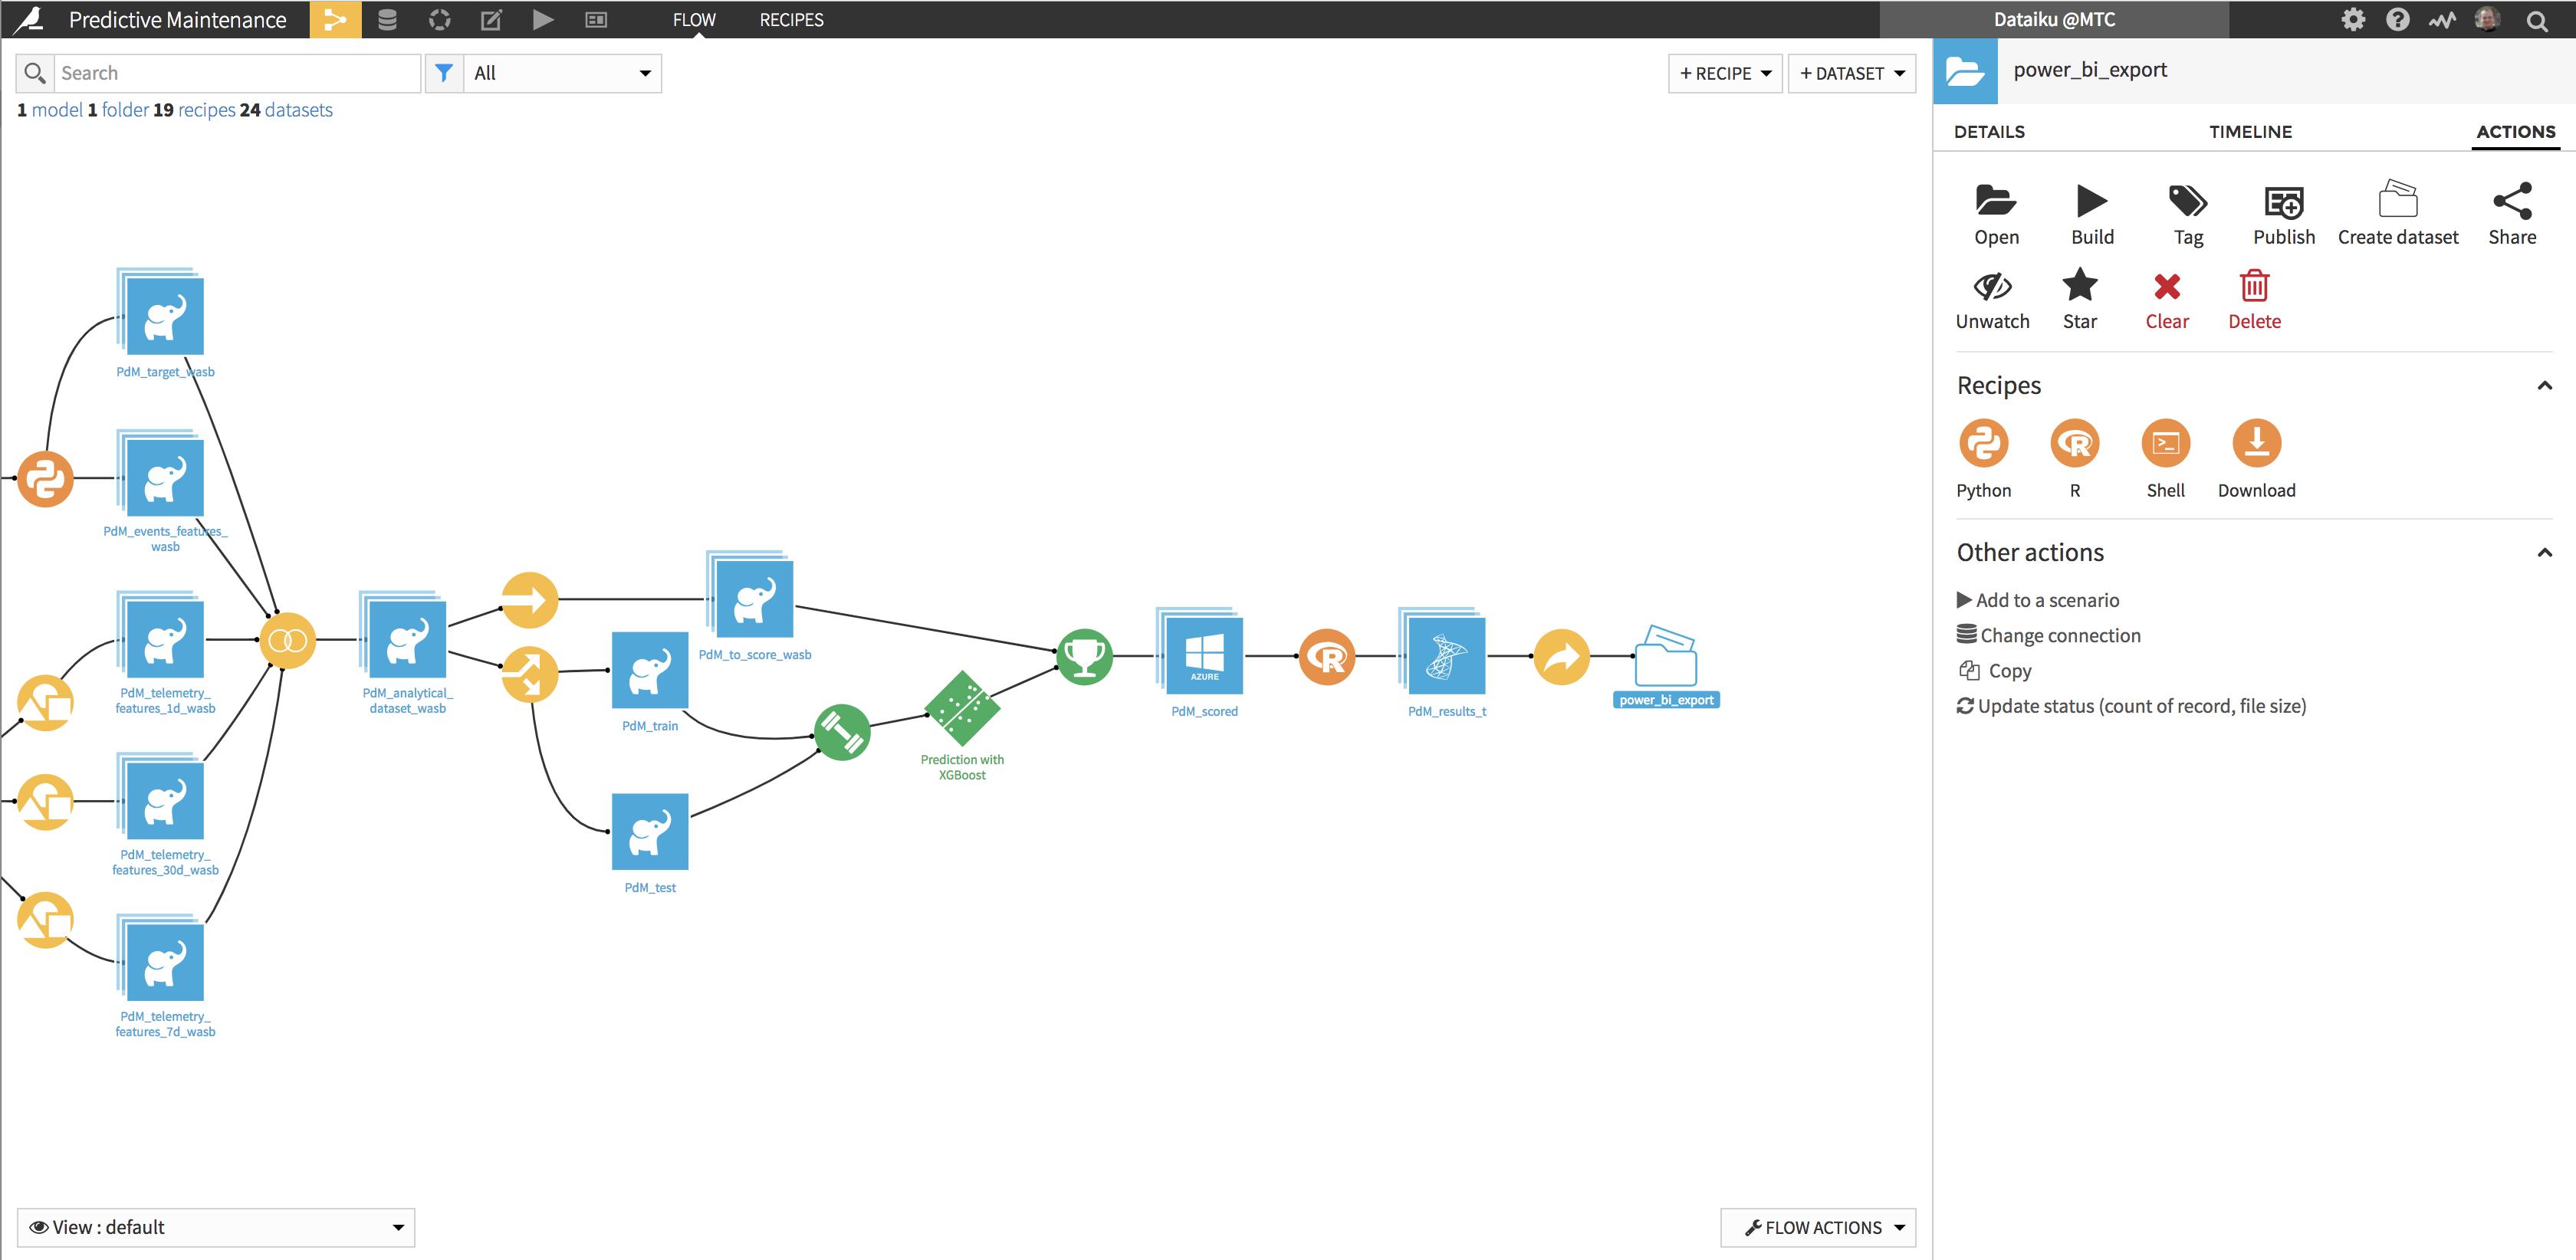 Microsoft Power BI   Dataiku - Your Path to Enterprise AI